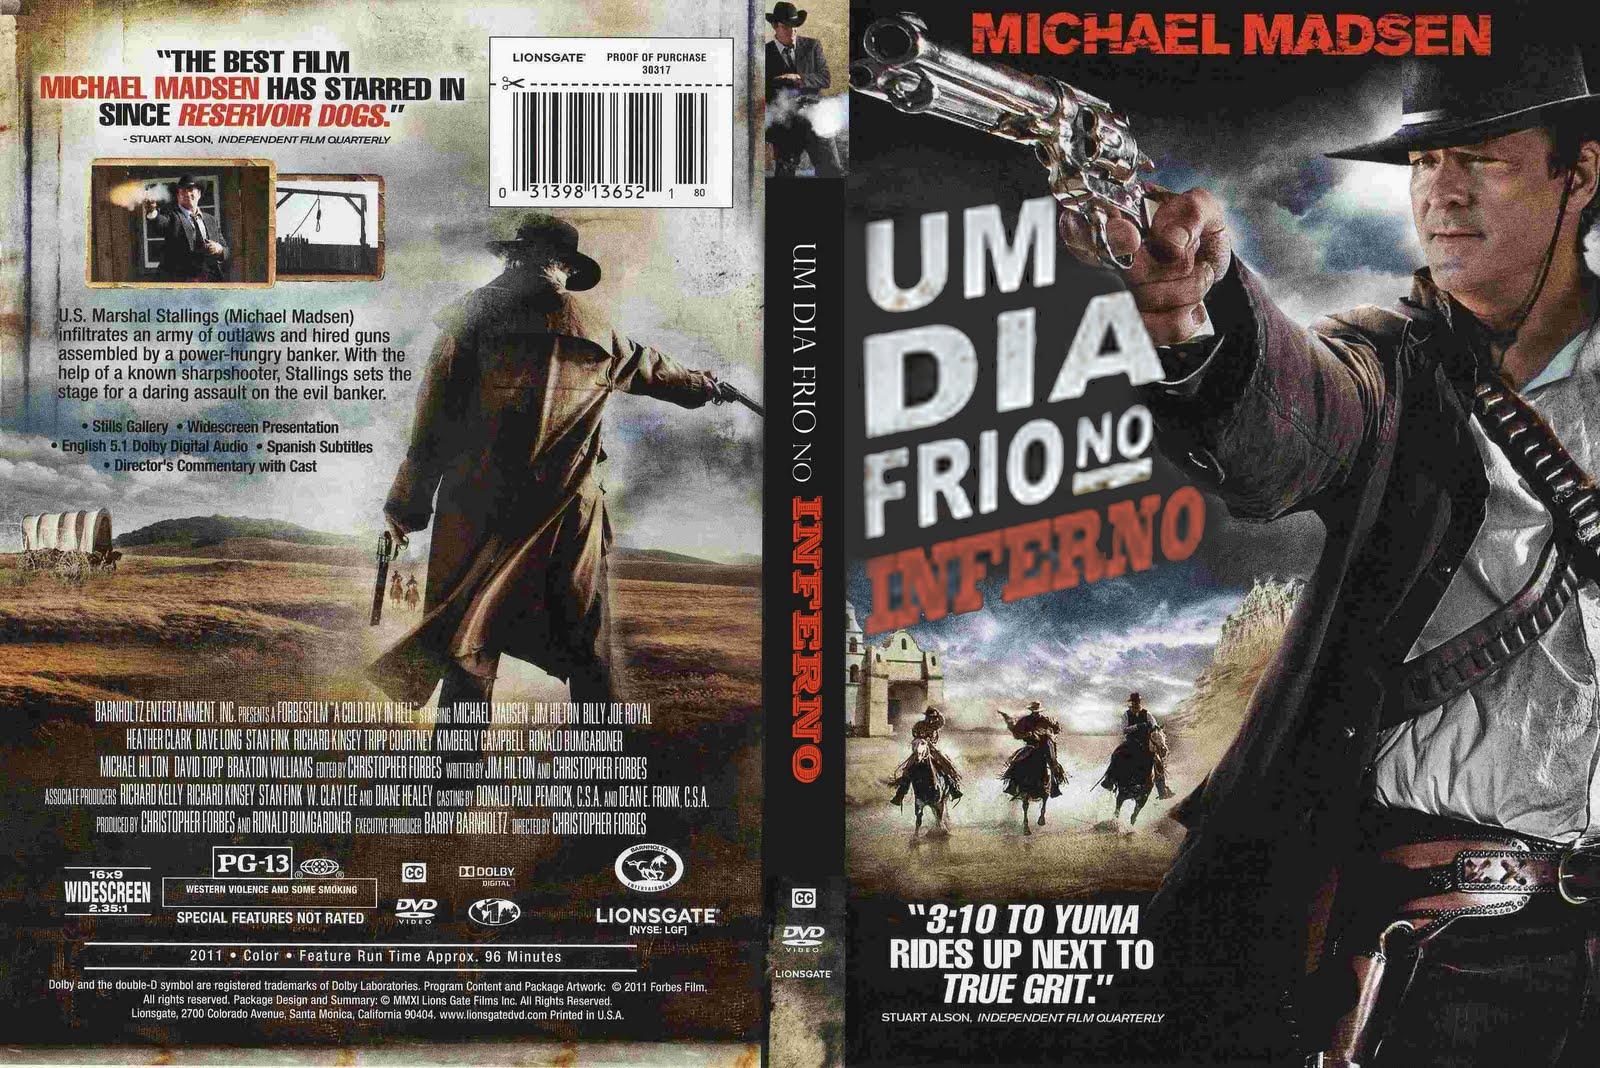 http://2.bp.blogspot.com/-l3tYcCAKv9Q/TjK7BkZb6BI/AAAAAAAABEc/-DzOfBpK6Y0/s1600/Um_dia_Frio_no_Inferno_-_CAPASBR.jpg